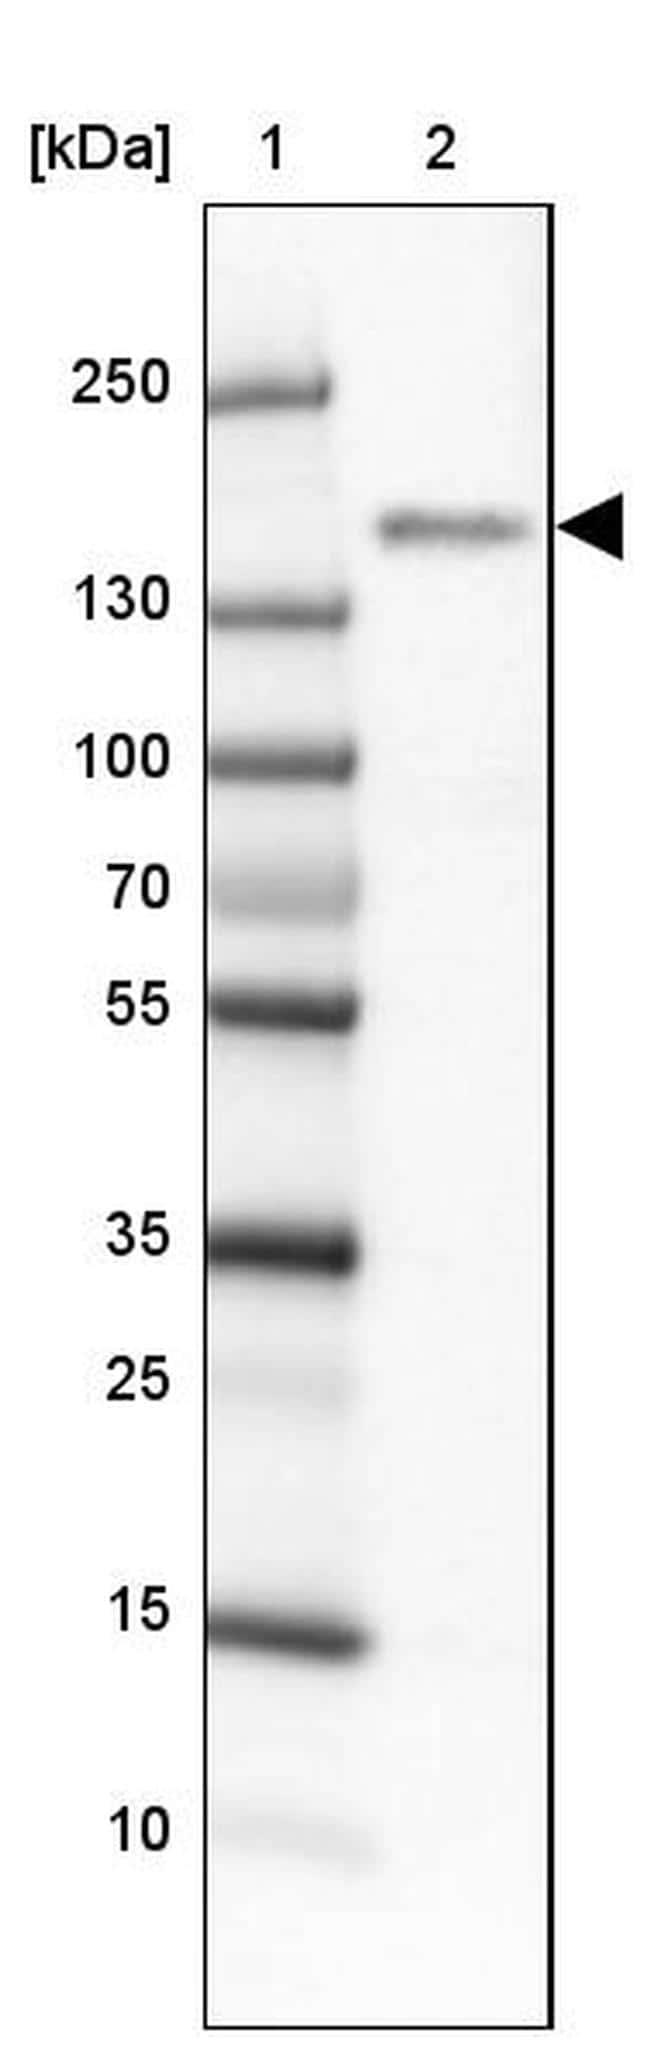 BIKE Antibody in Western Blot (WB)